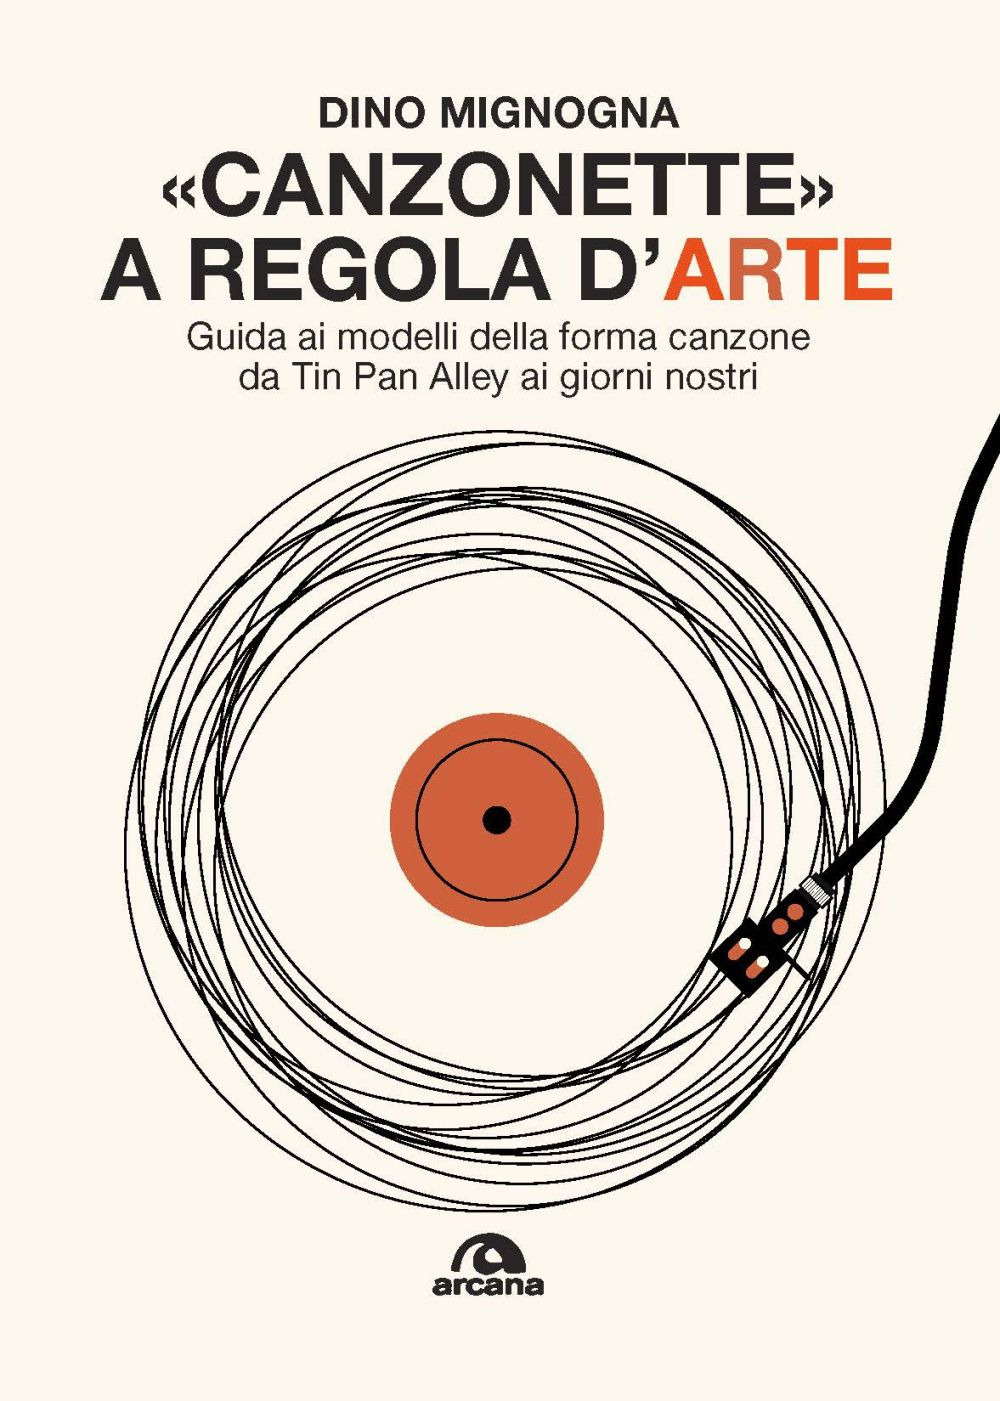 CANZONETTE A REGOLA D'ARTE - Mignogna Dino - 9788862318389